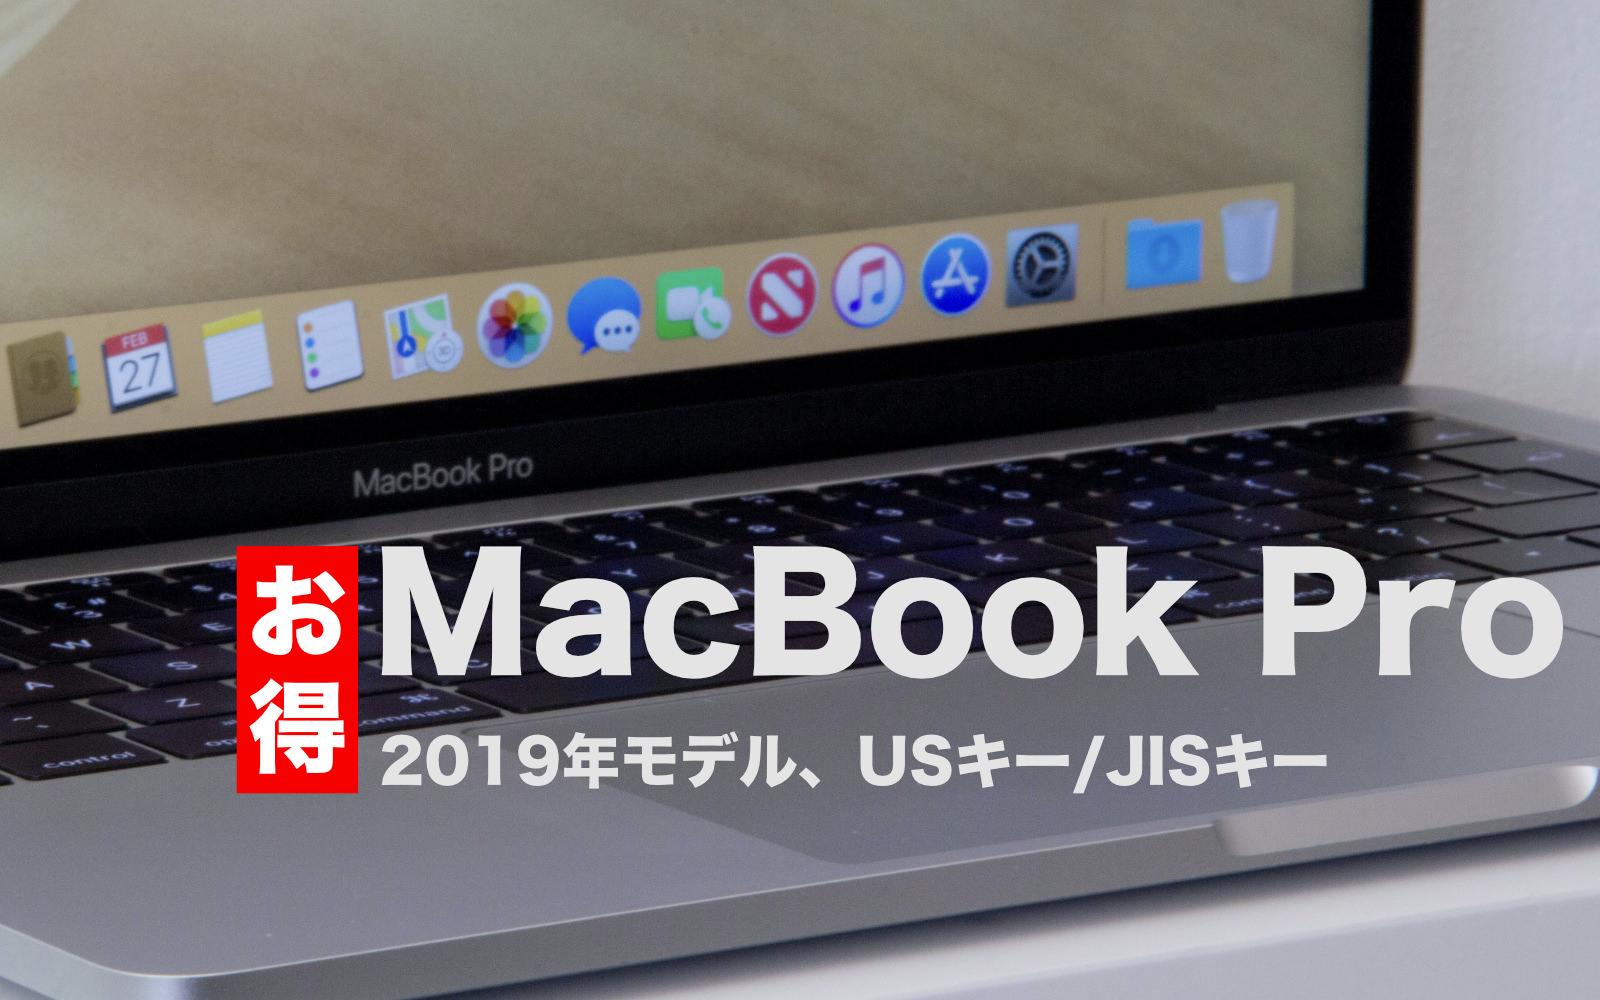 MacBook Pro 13inch sale